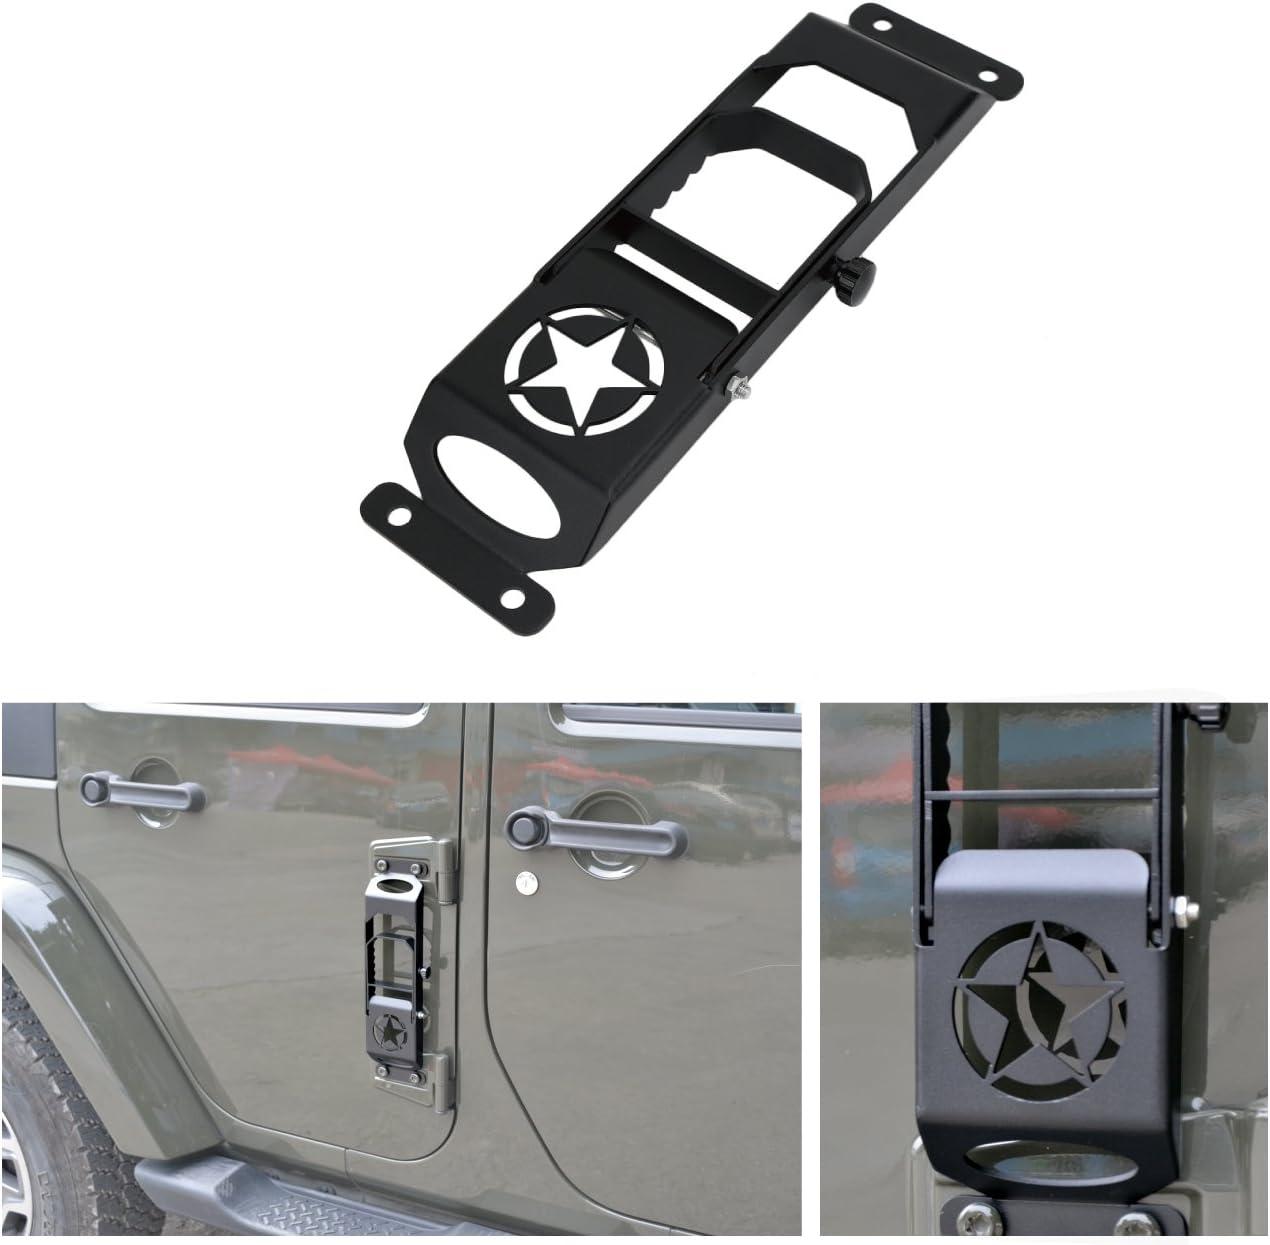 MASION Door Steps Door Hinges for Jeep Wrangler JK 2007-2017 Foot Pedal Peg Military Star Black Metal Solid Steel